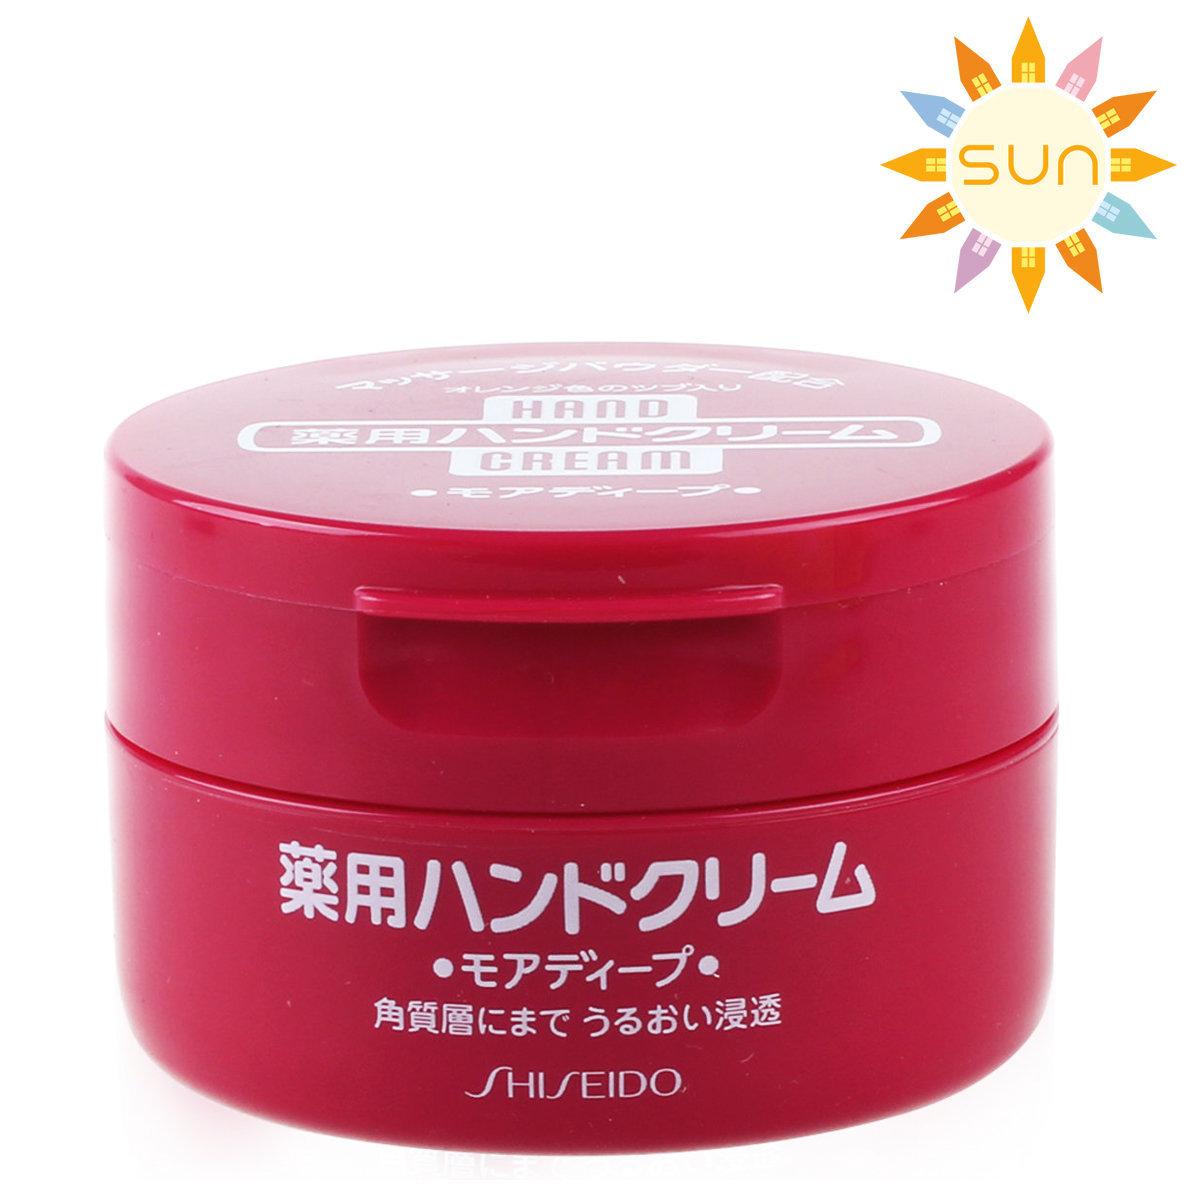 Moist Hand Cream 100g [Parallel Import]